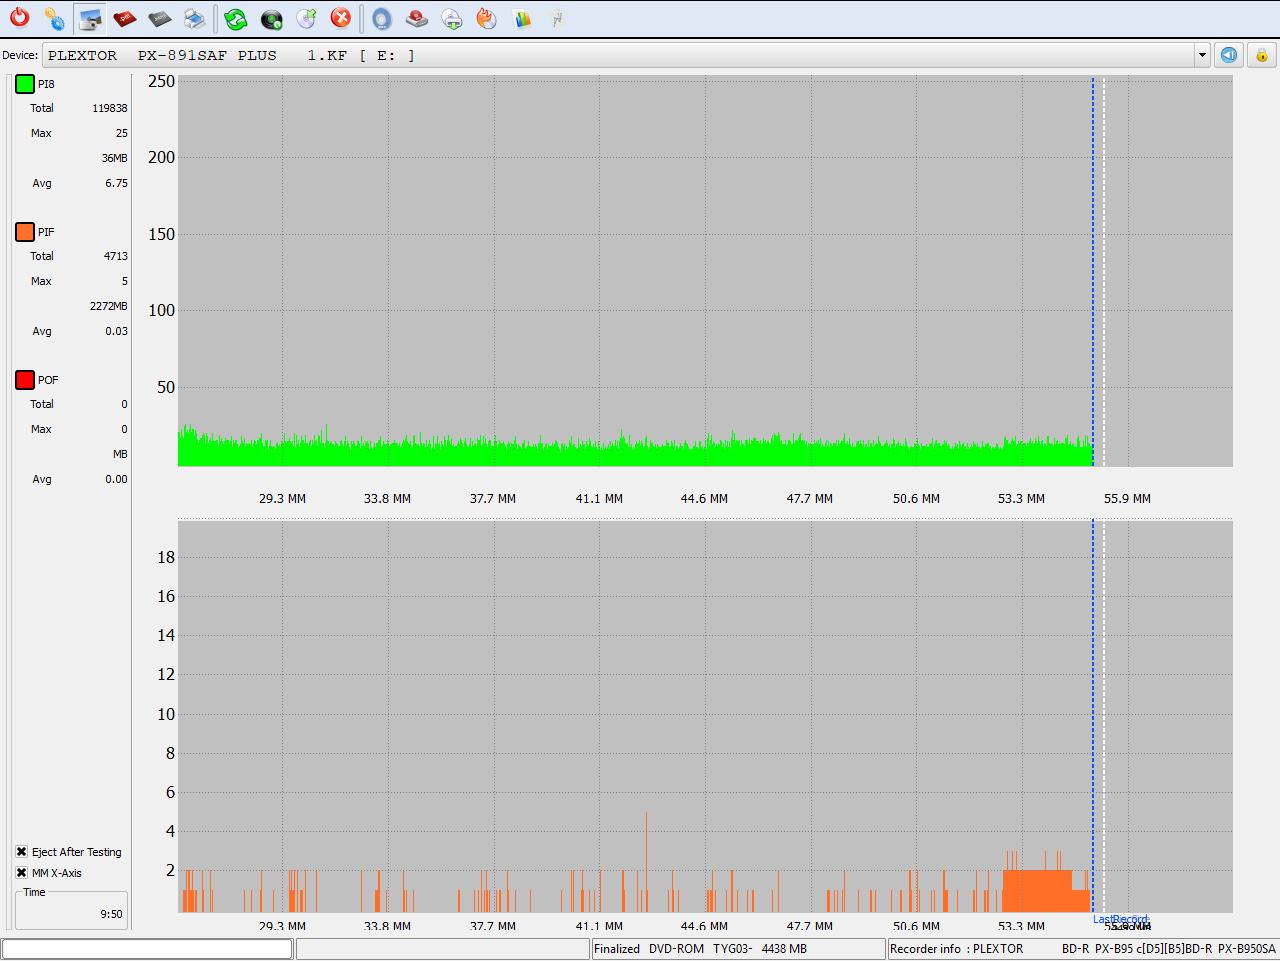 Binary Files for Plextor PX-950B and PX-950LB-plextor-950-b-sa-tyg03-12x.png